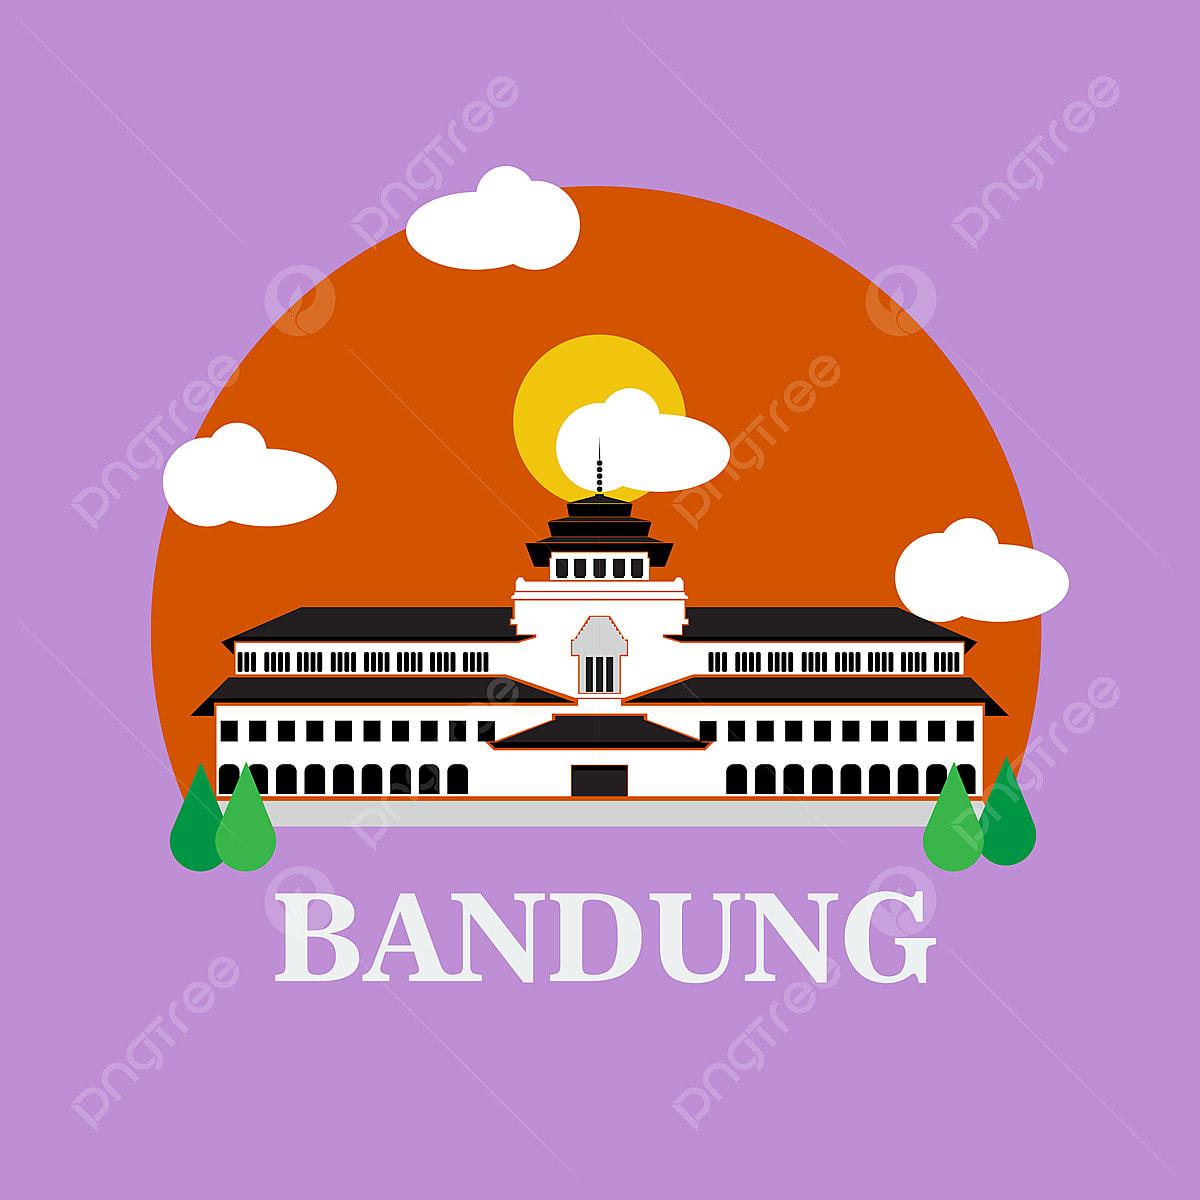 Jarrdin Cihampelas Bandung City West Java: Bandung Landmark Icon West Java Indonesia, Landscape